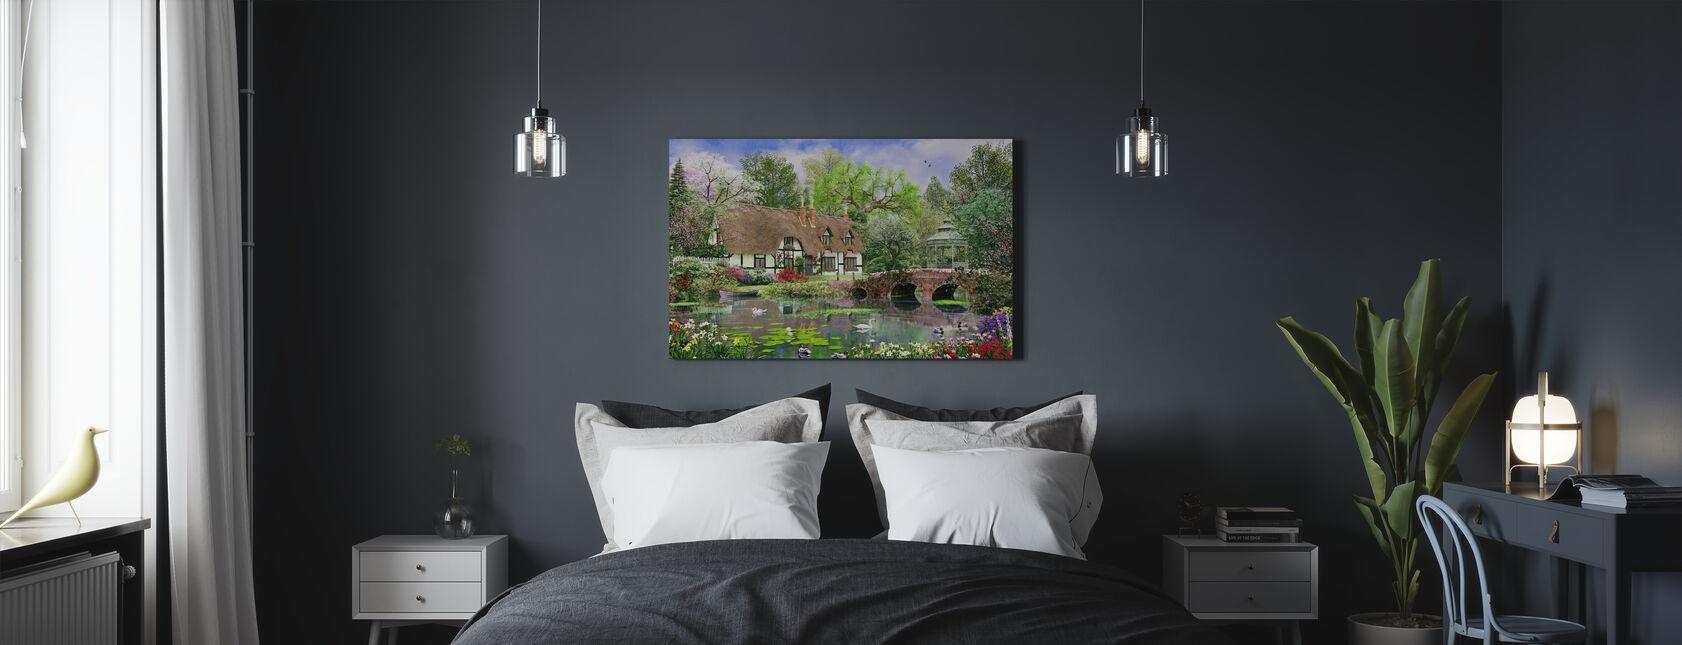 April Cottage - Canvas print - Bedroom